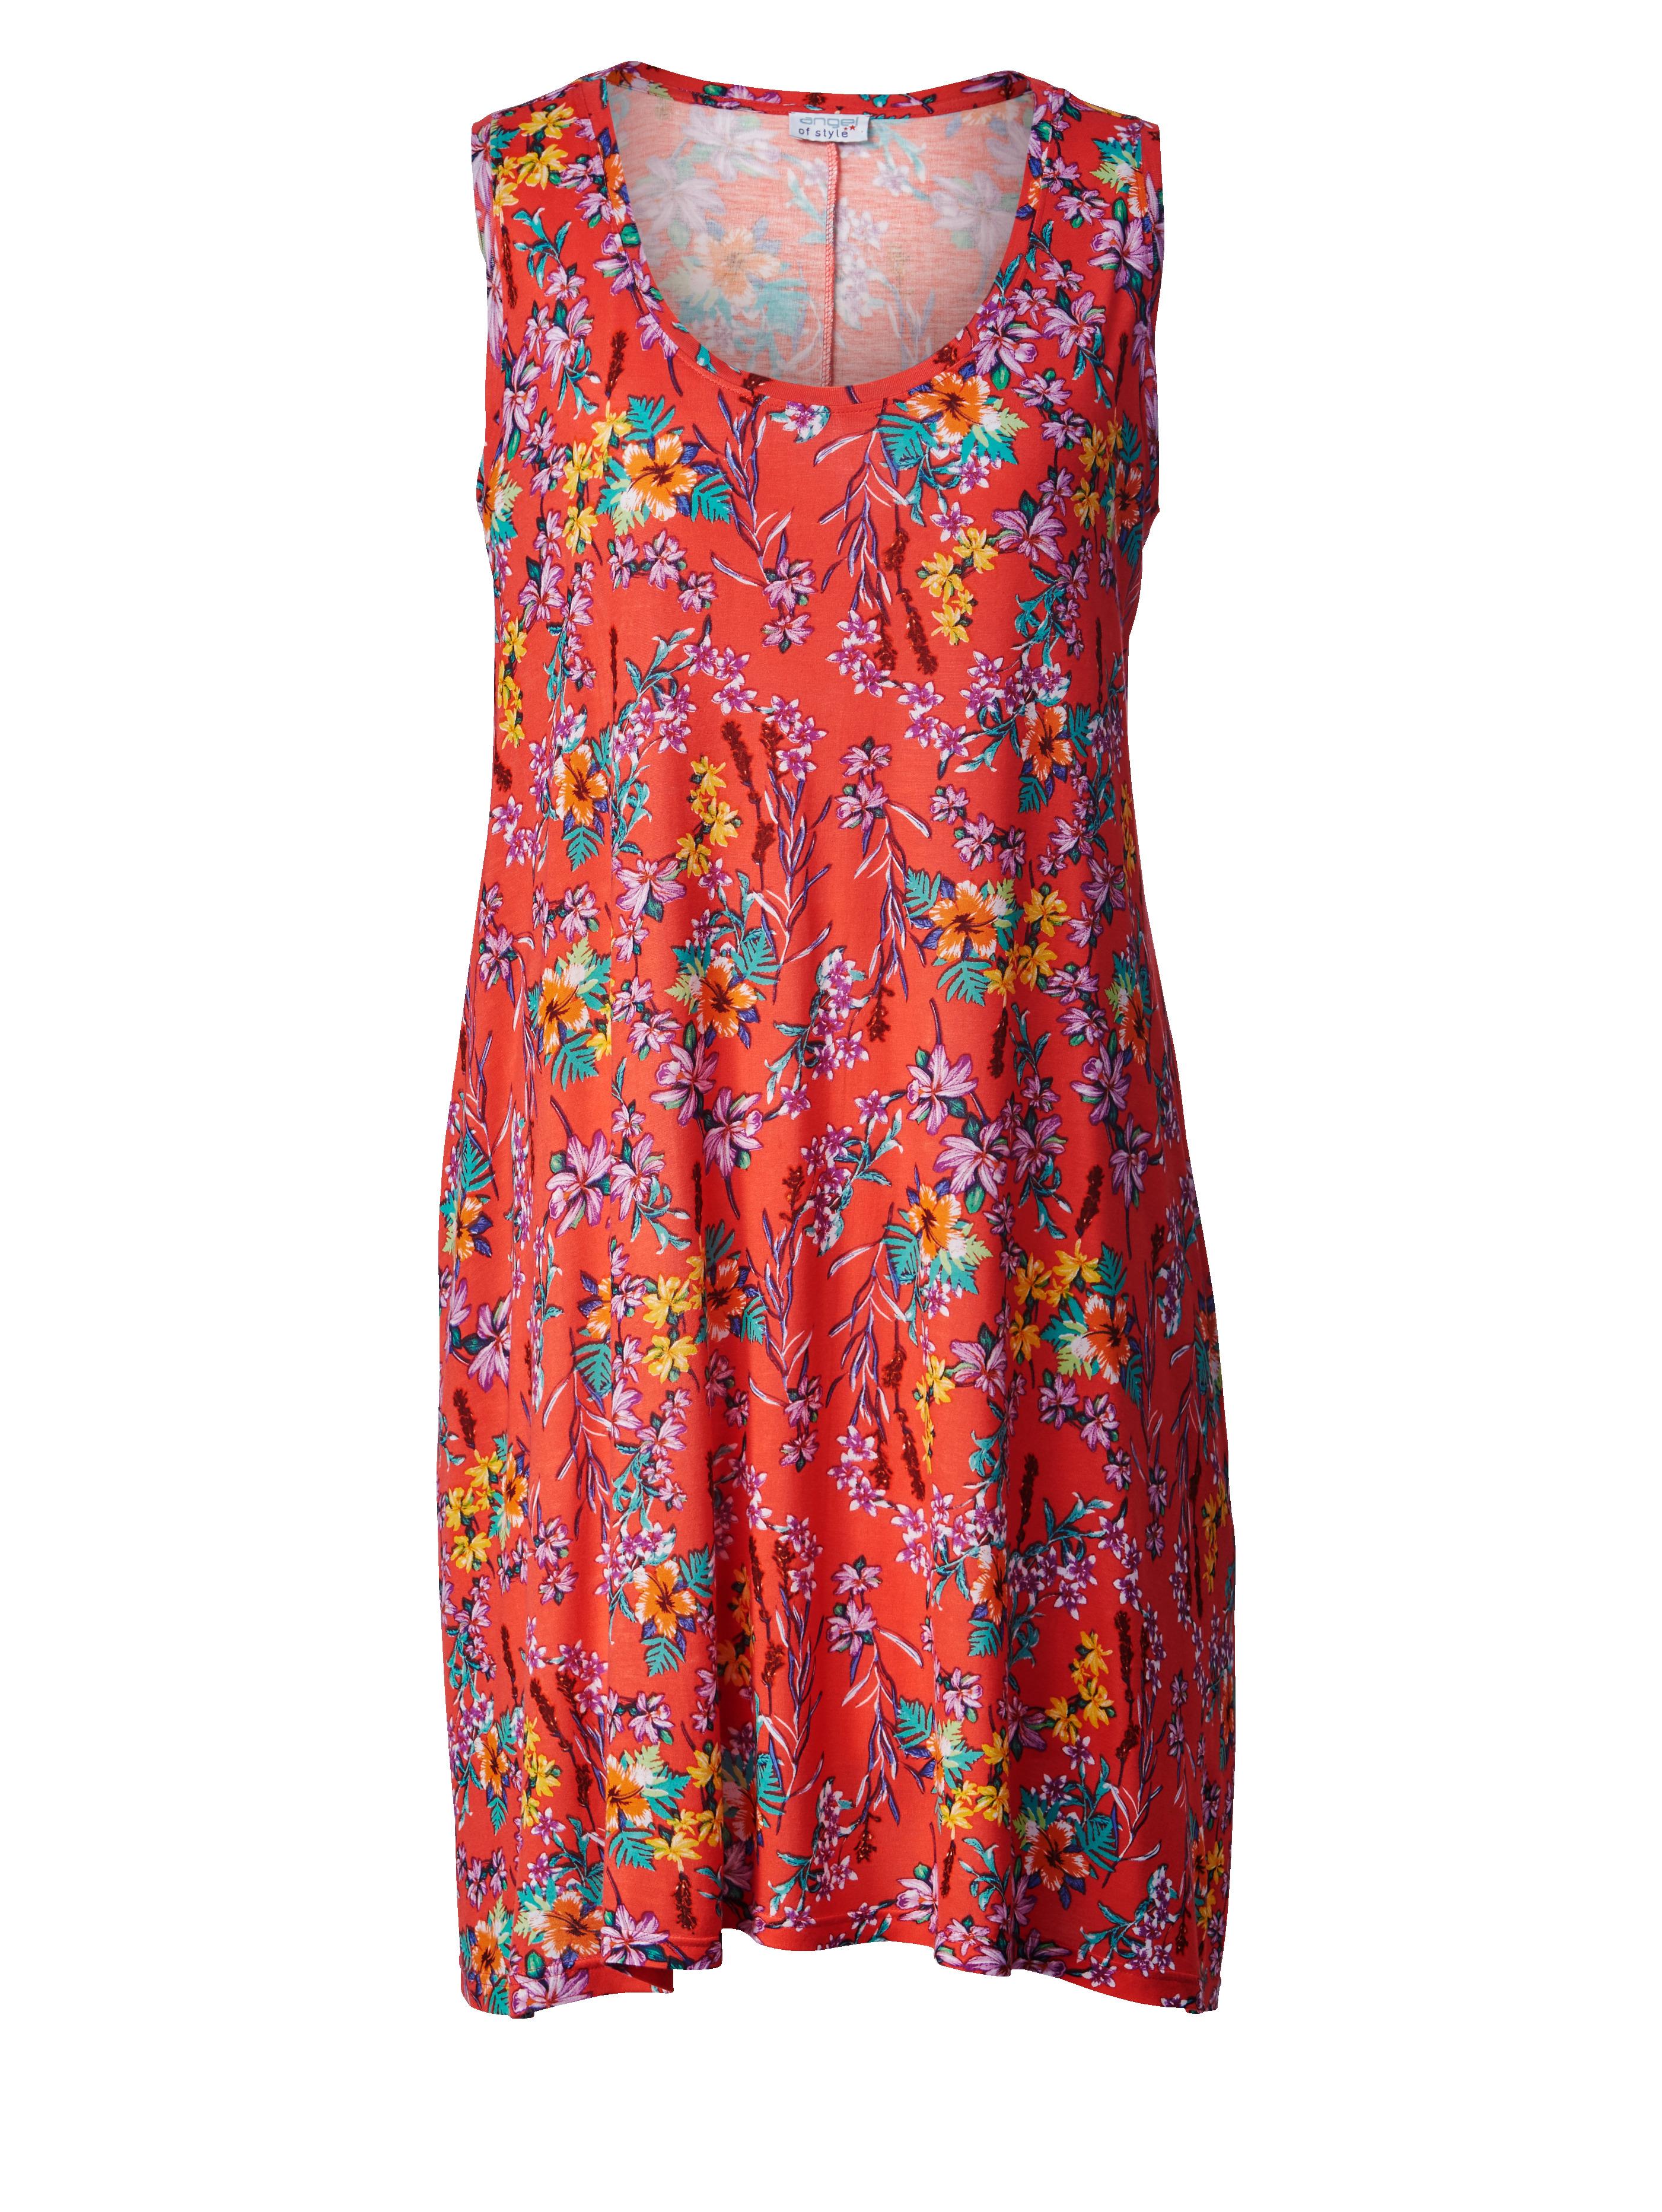 Jersey šaty s kvetinovou potlačou Angel of Style Červená - Glami.sk 10a48dbda9b